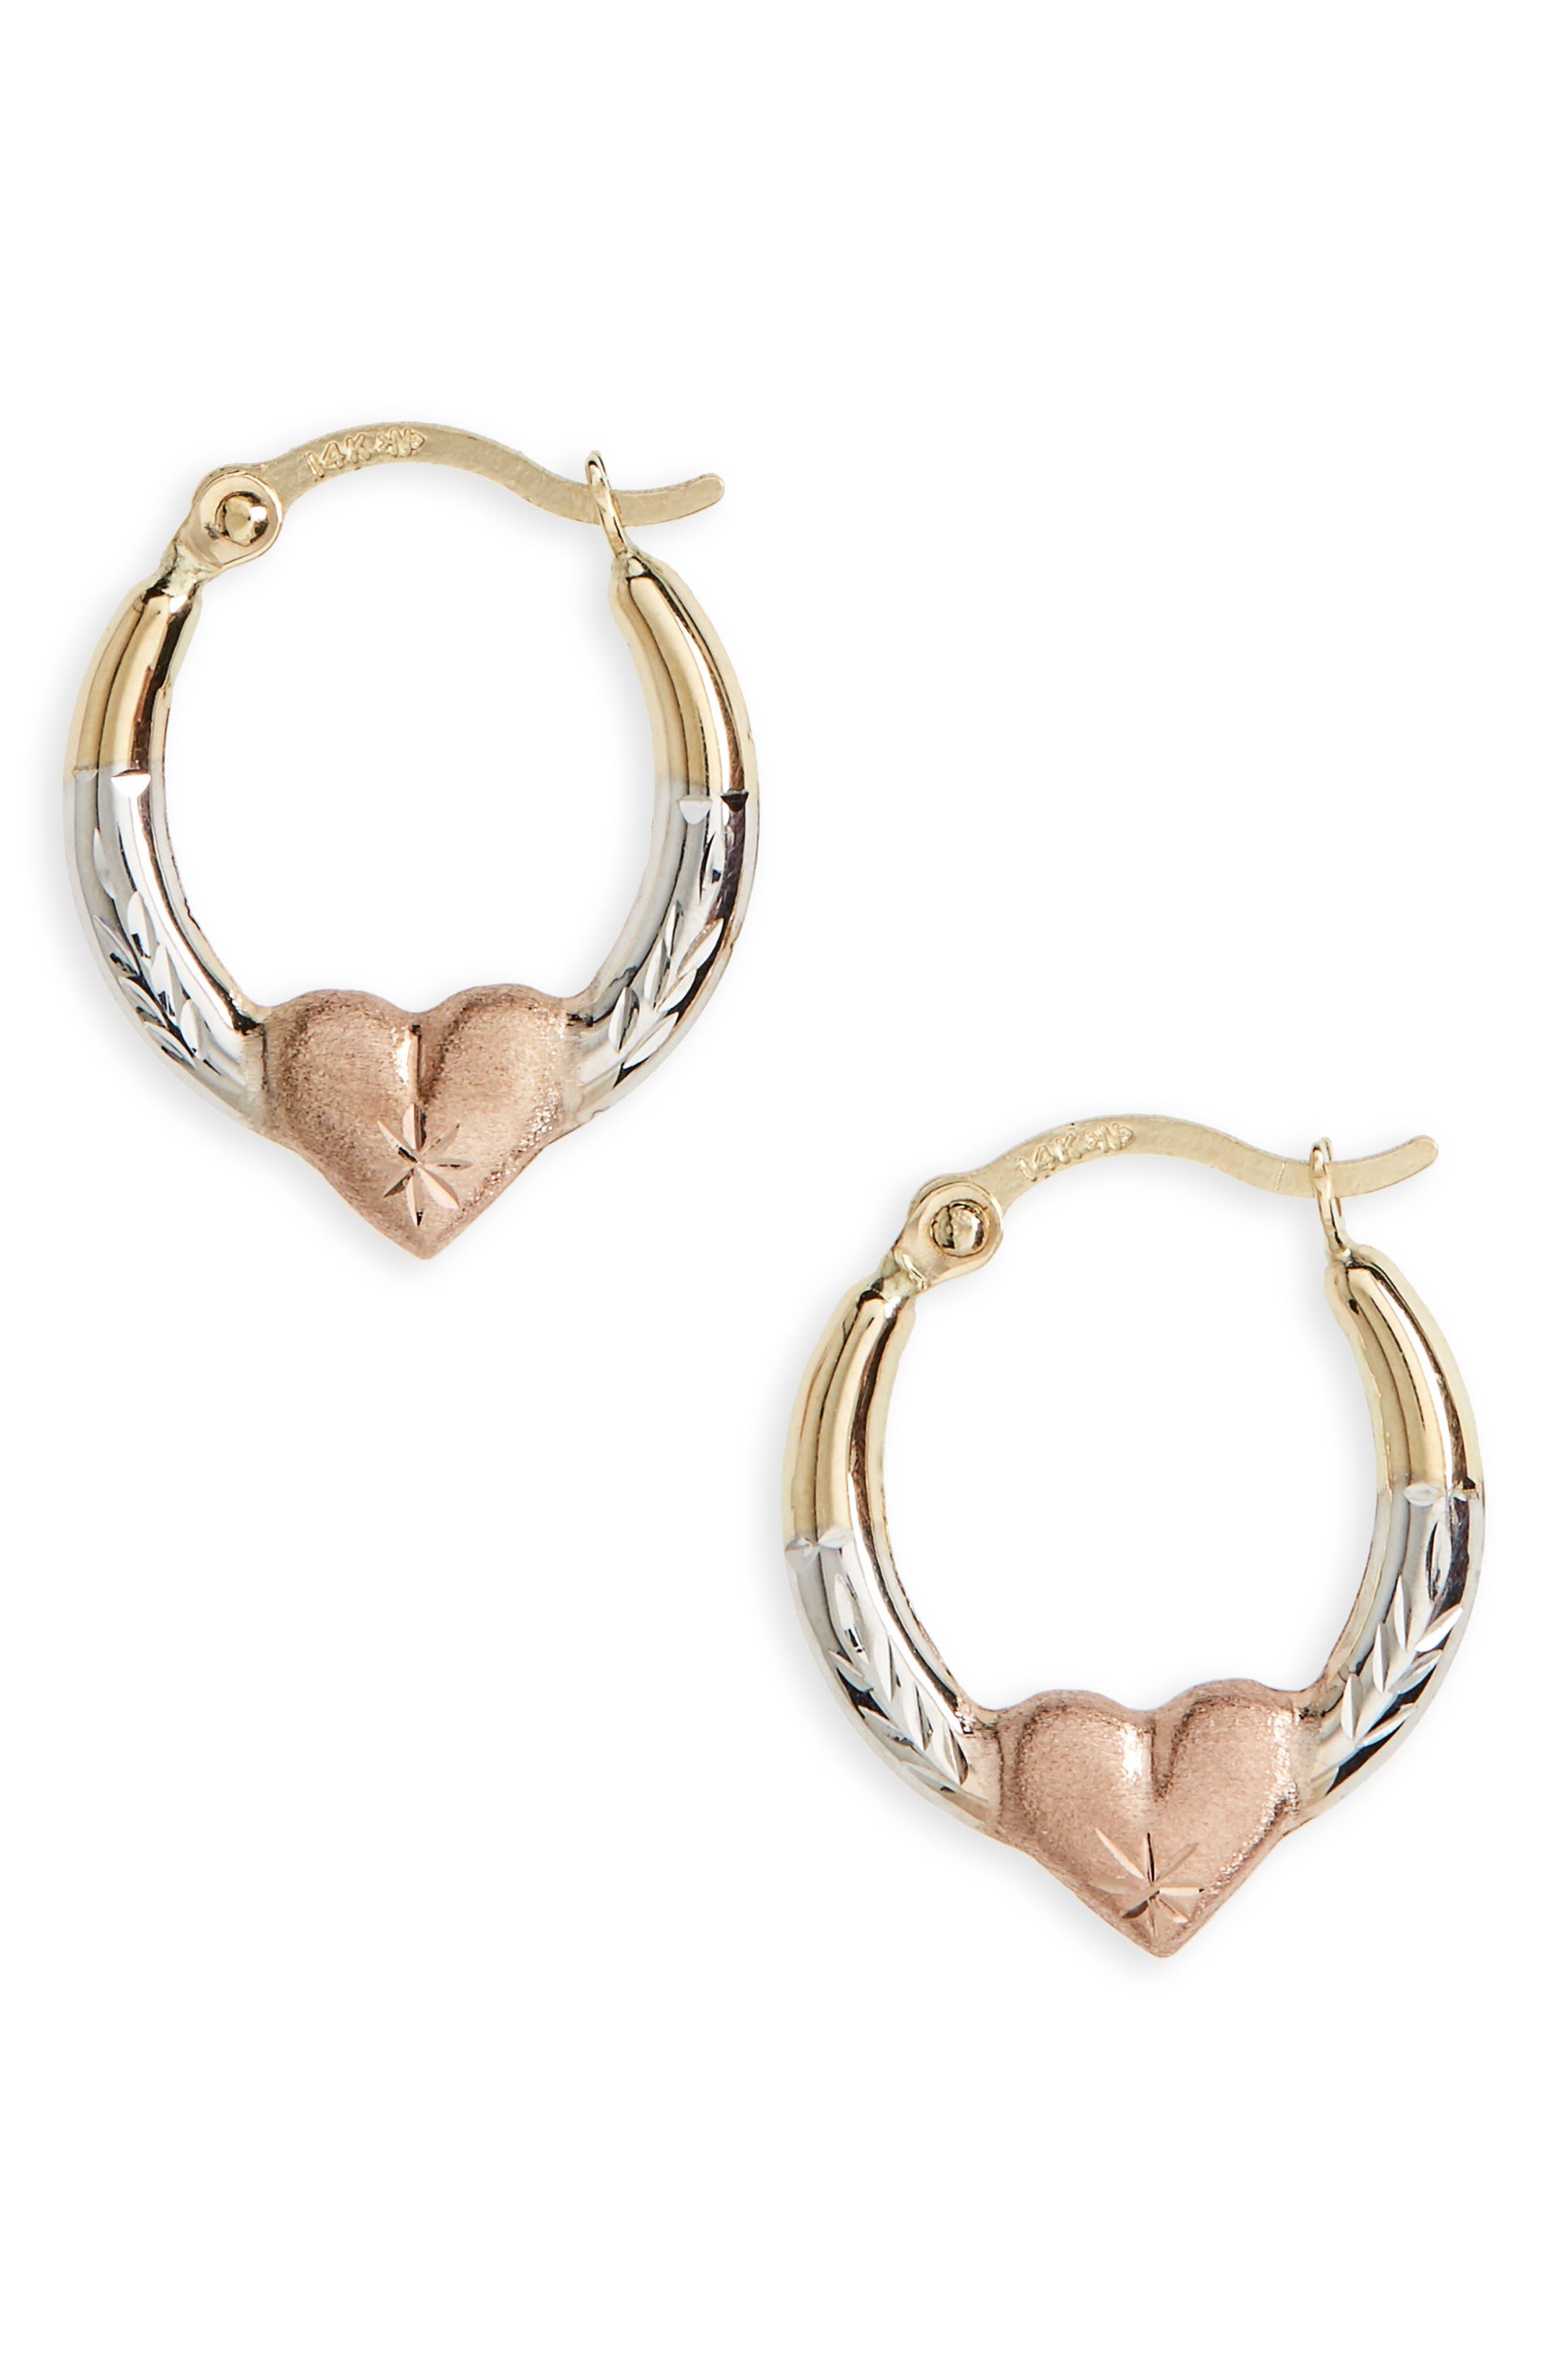 Kardee Kids 14k Gold Heart Hoop Earrings,                             Main thumbnail 1, color,                             710